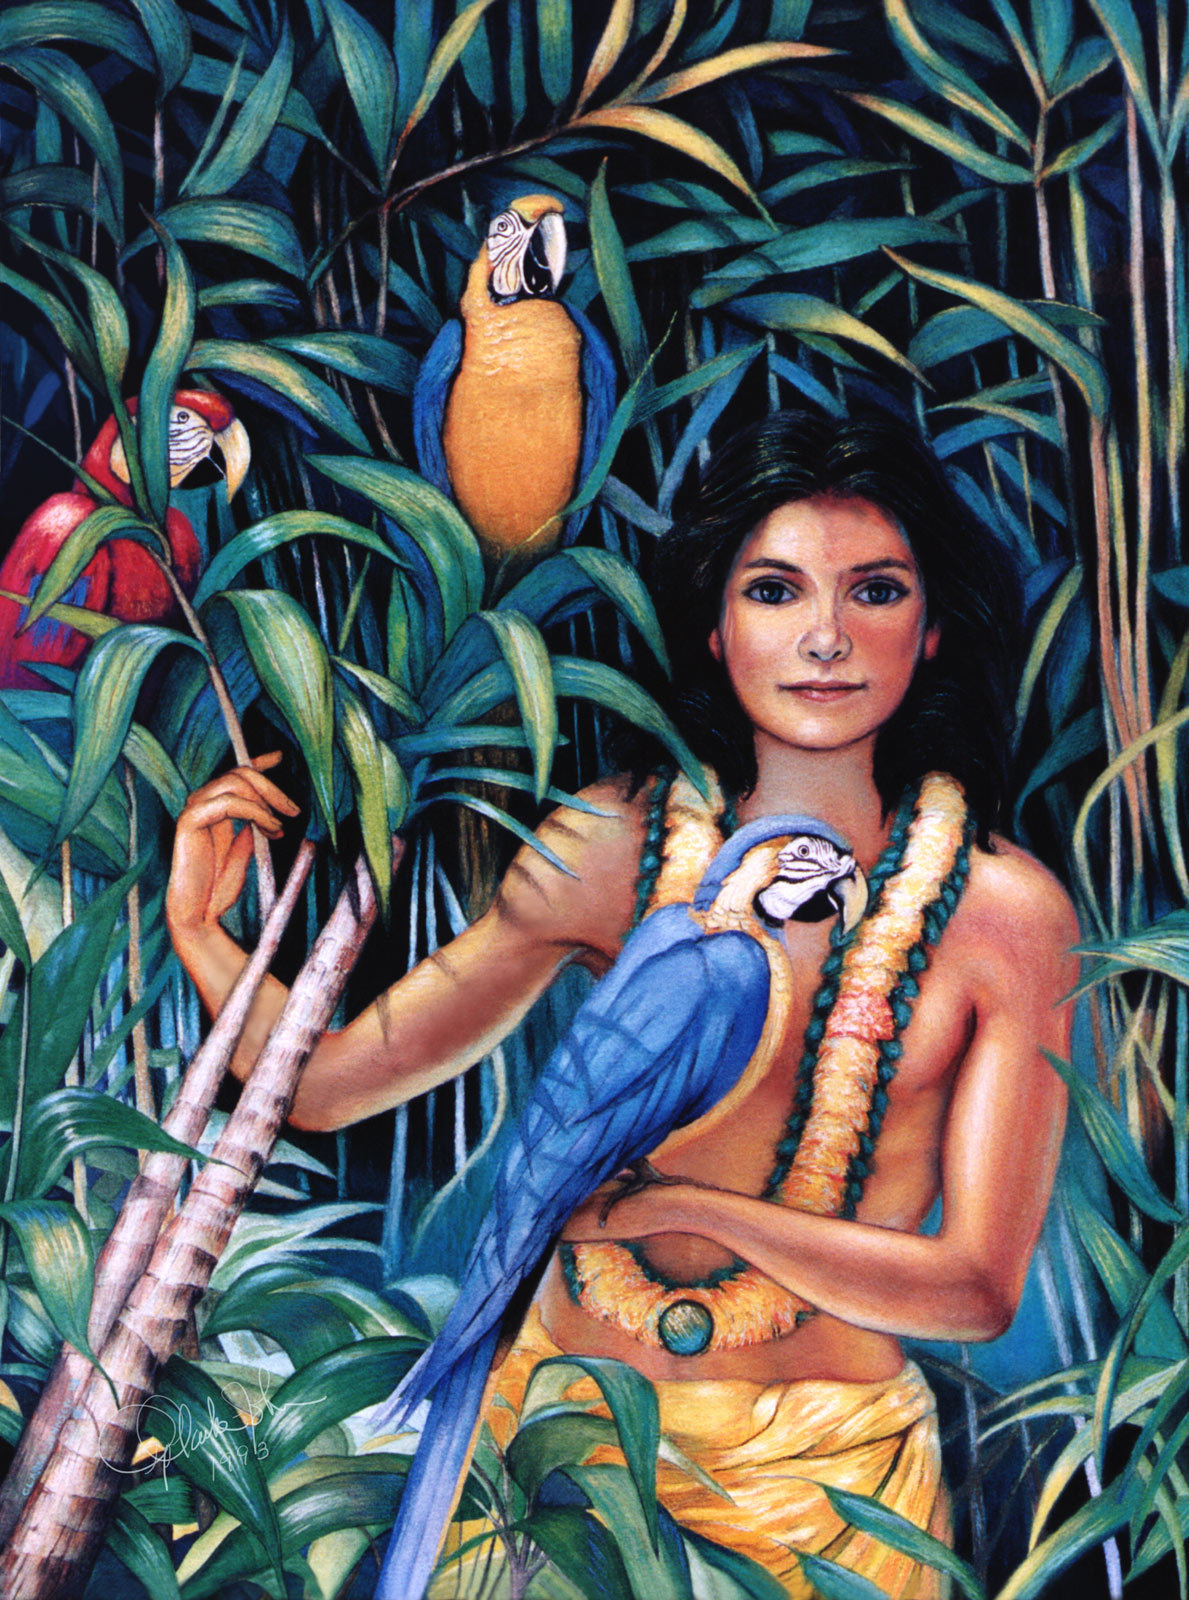 Vedanta boy and parrots 1 ead551c5 xq67